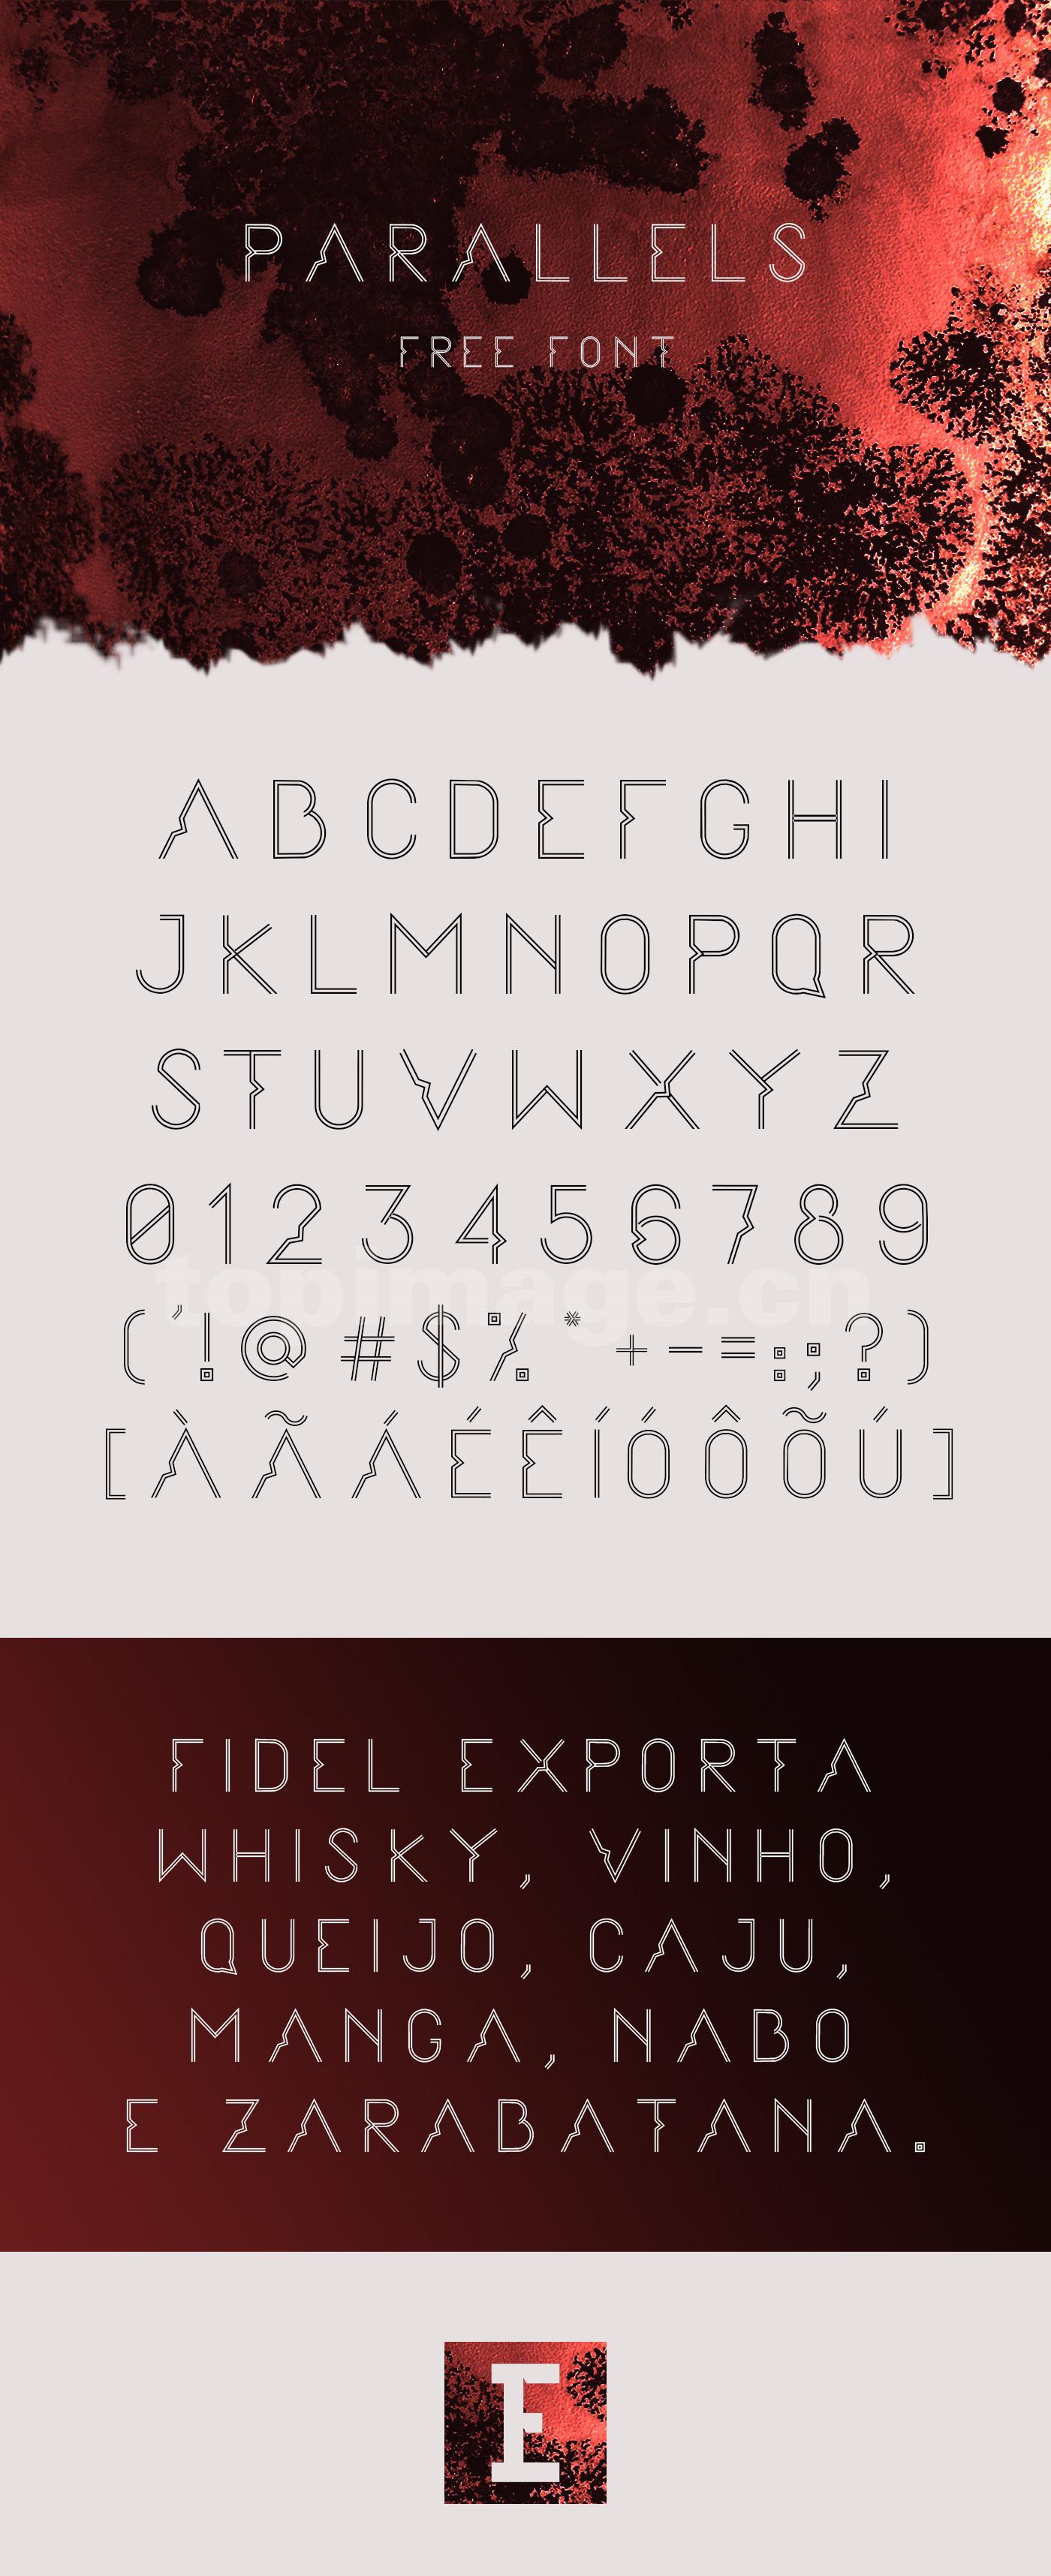 Parallels复古线性个性化纤细海报英文字体下载